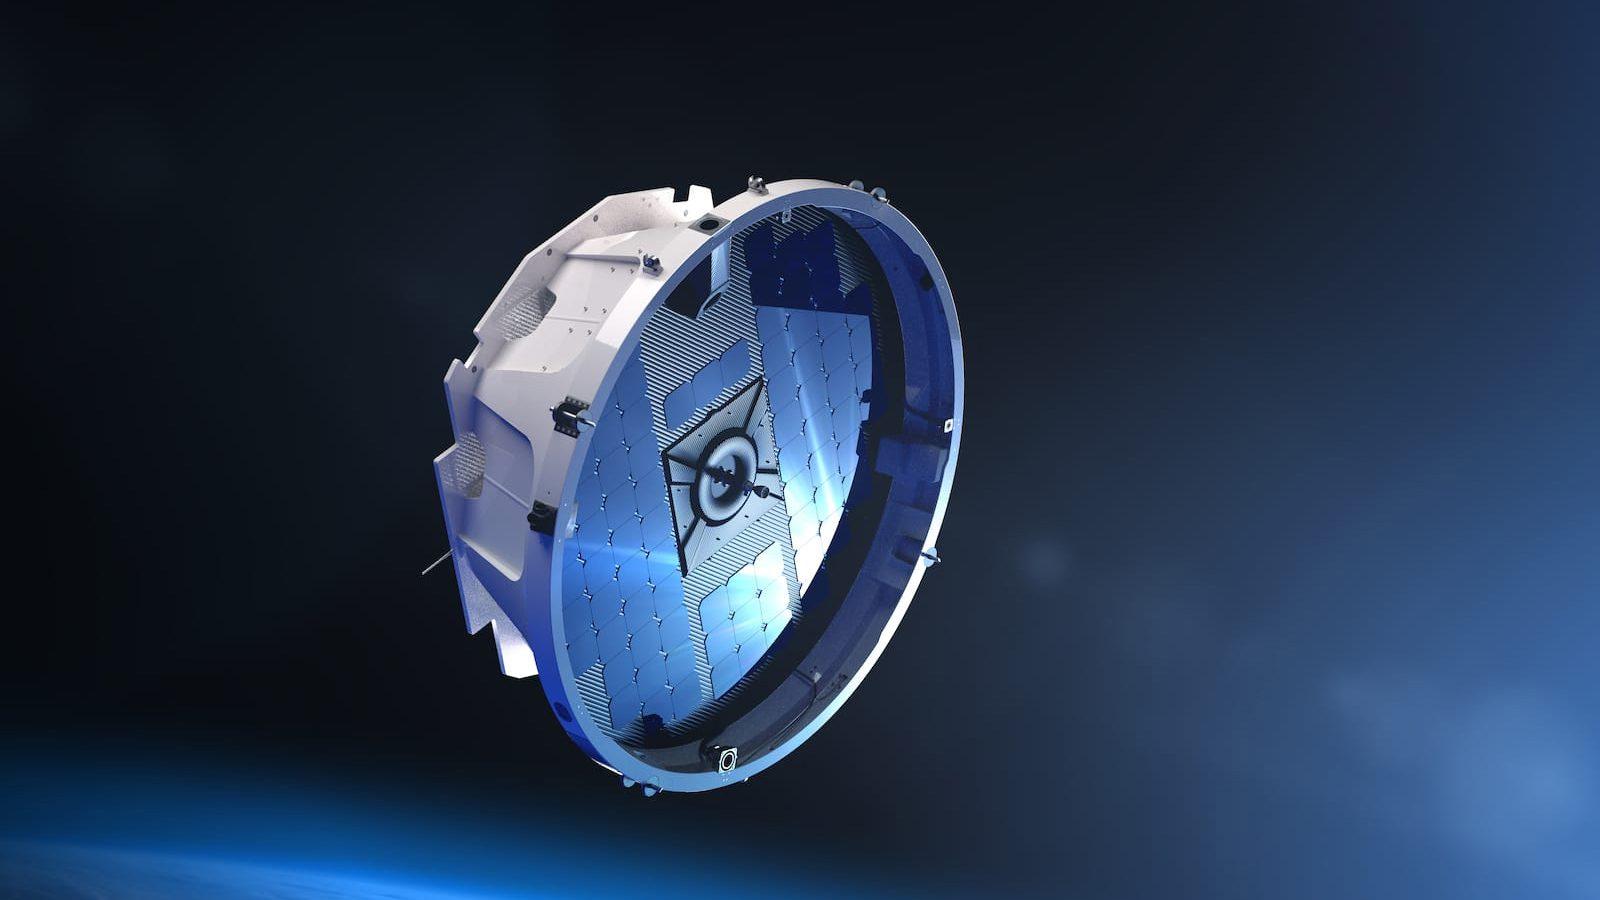 Rocket Lab takes its leap to build Photon satellite service program